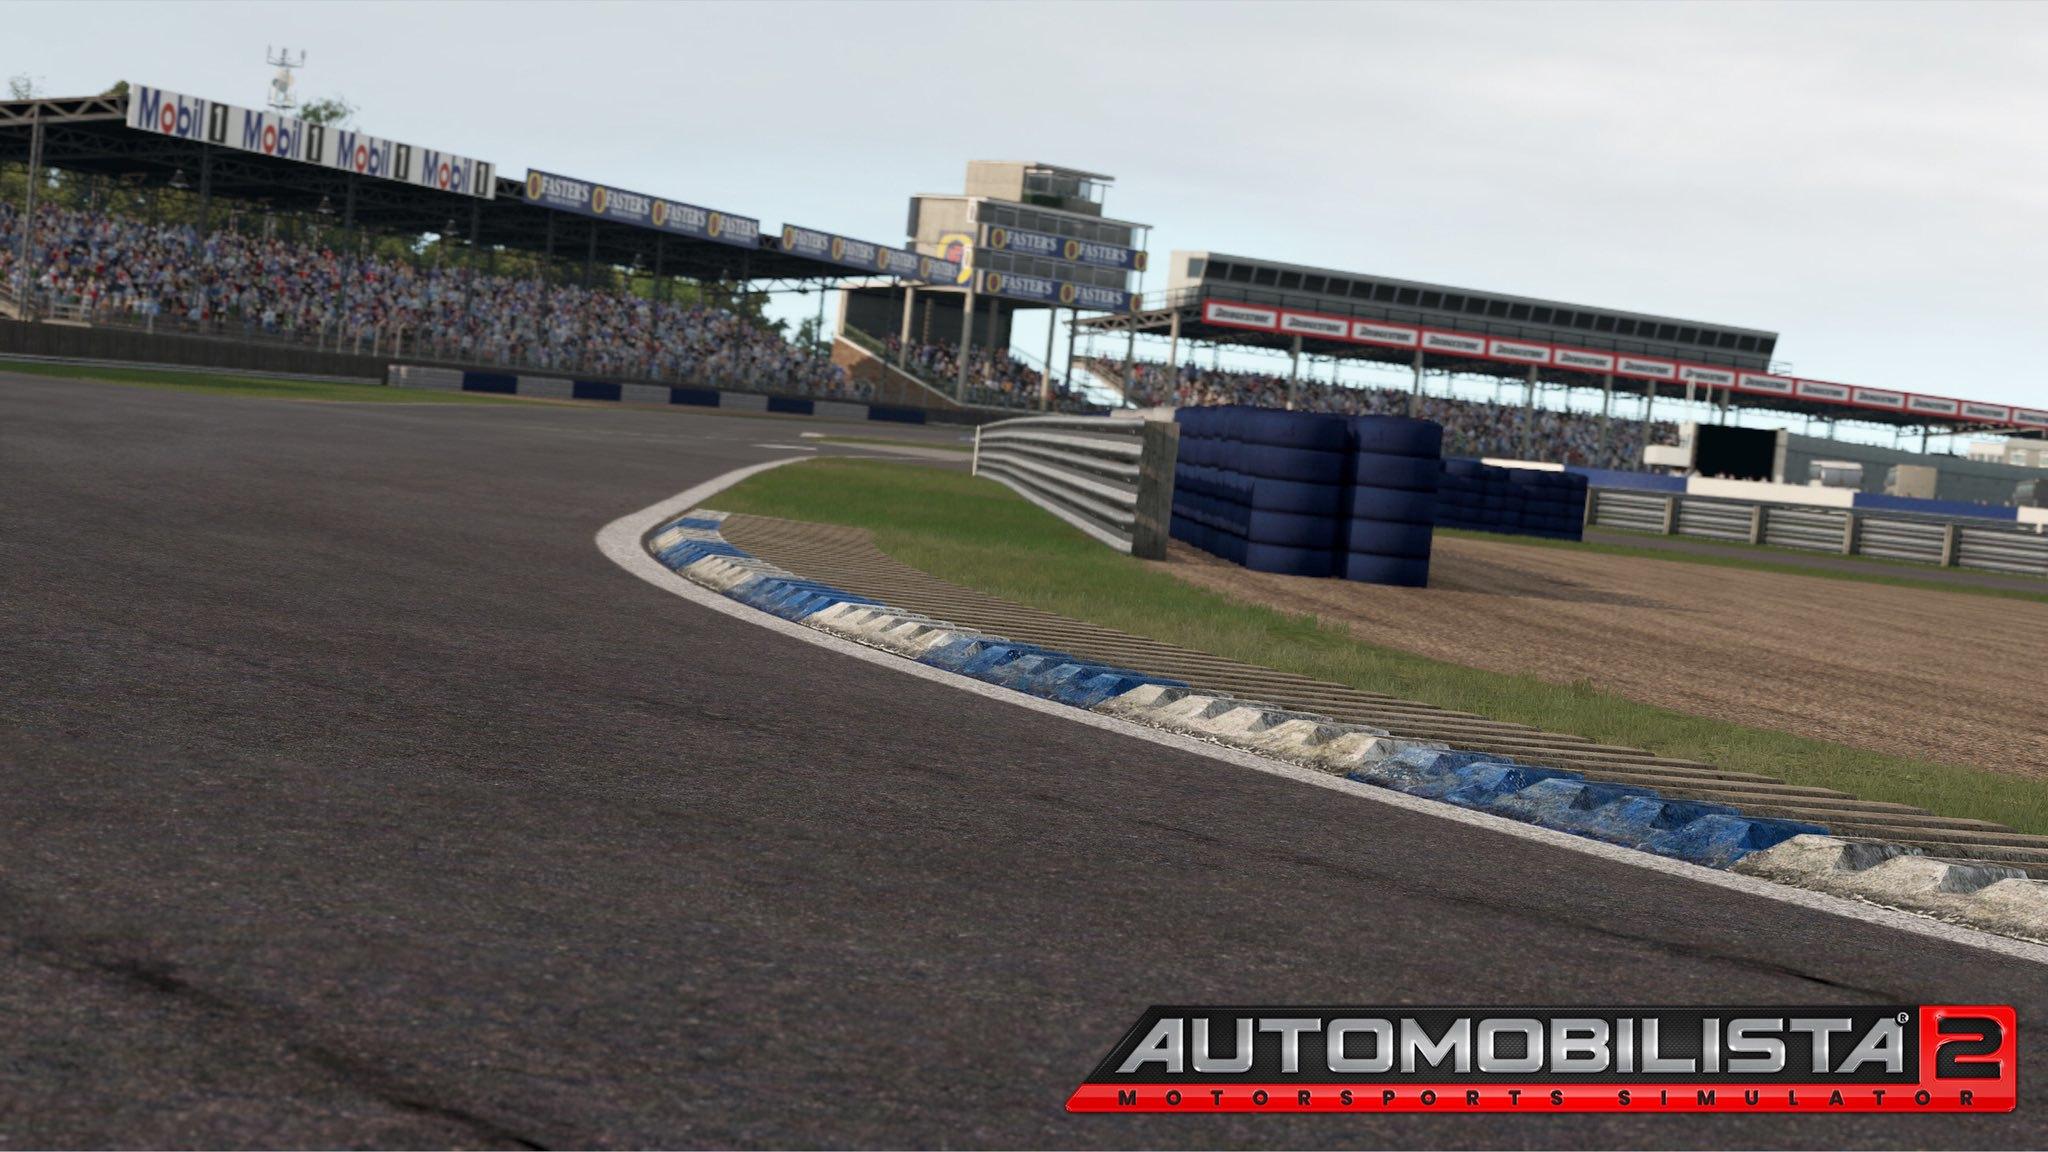 Automobilista Silverstone 4